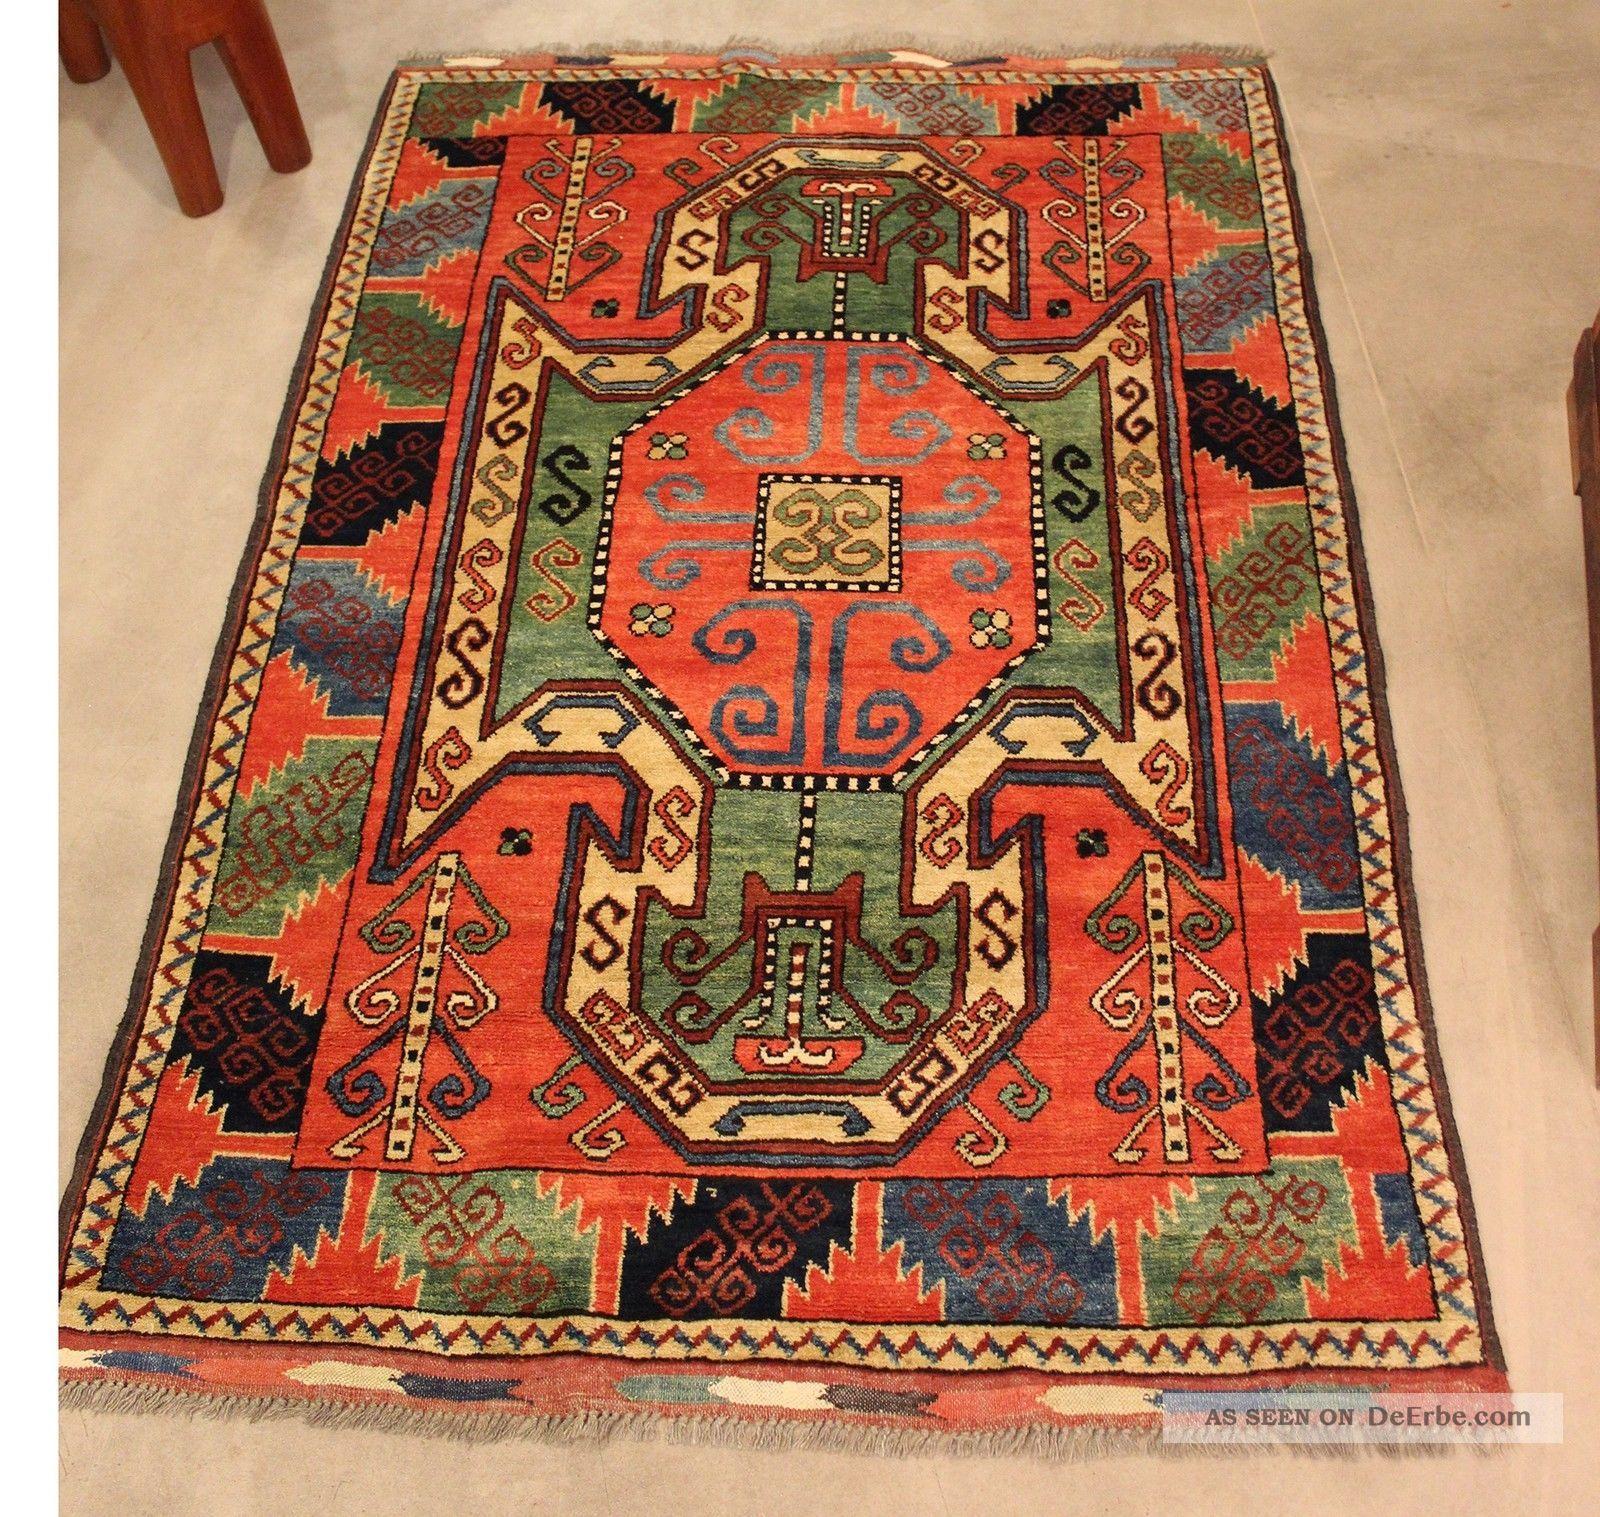 Antiker Teppich Tschapbaft Afghan 1 62 X 1 18 M Wolle